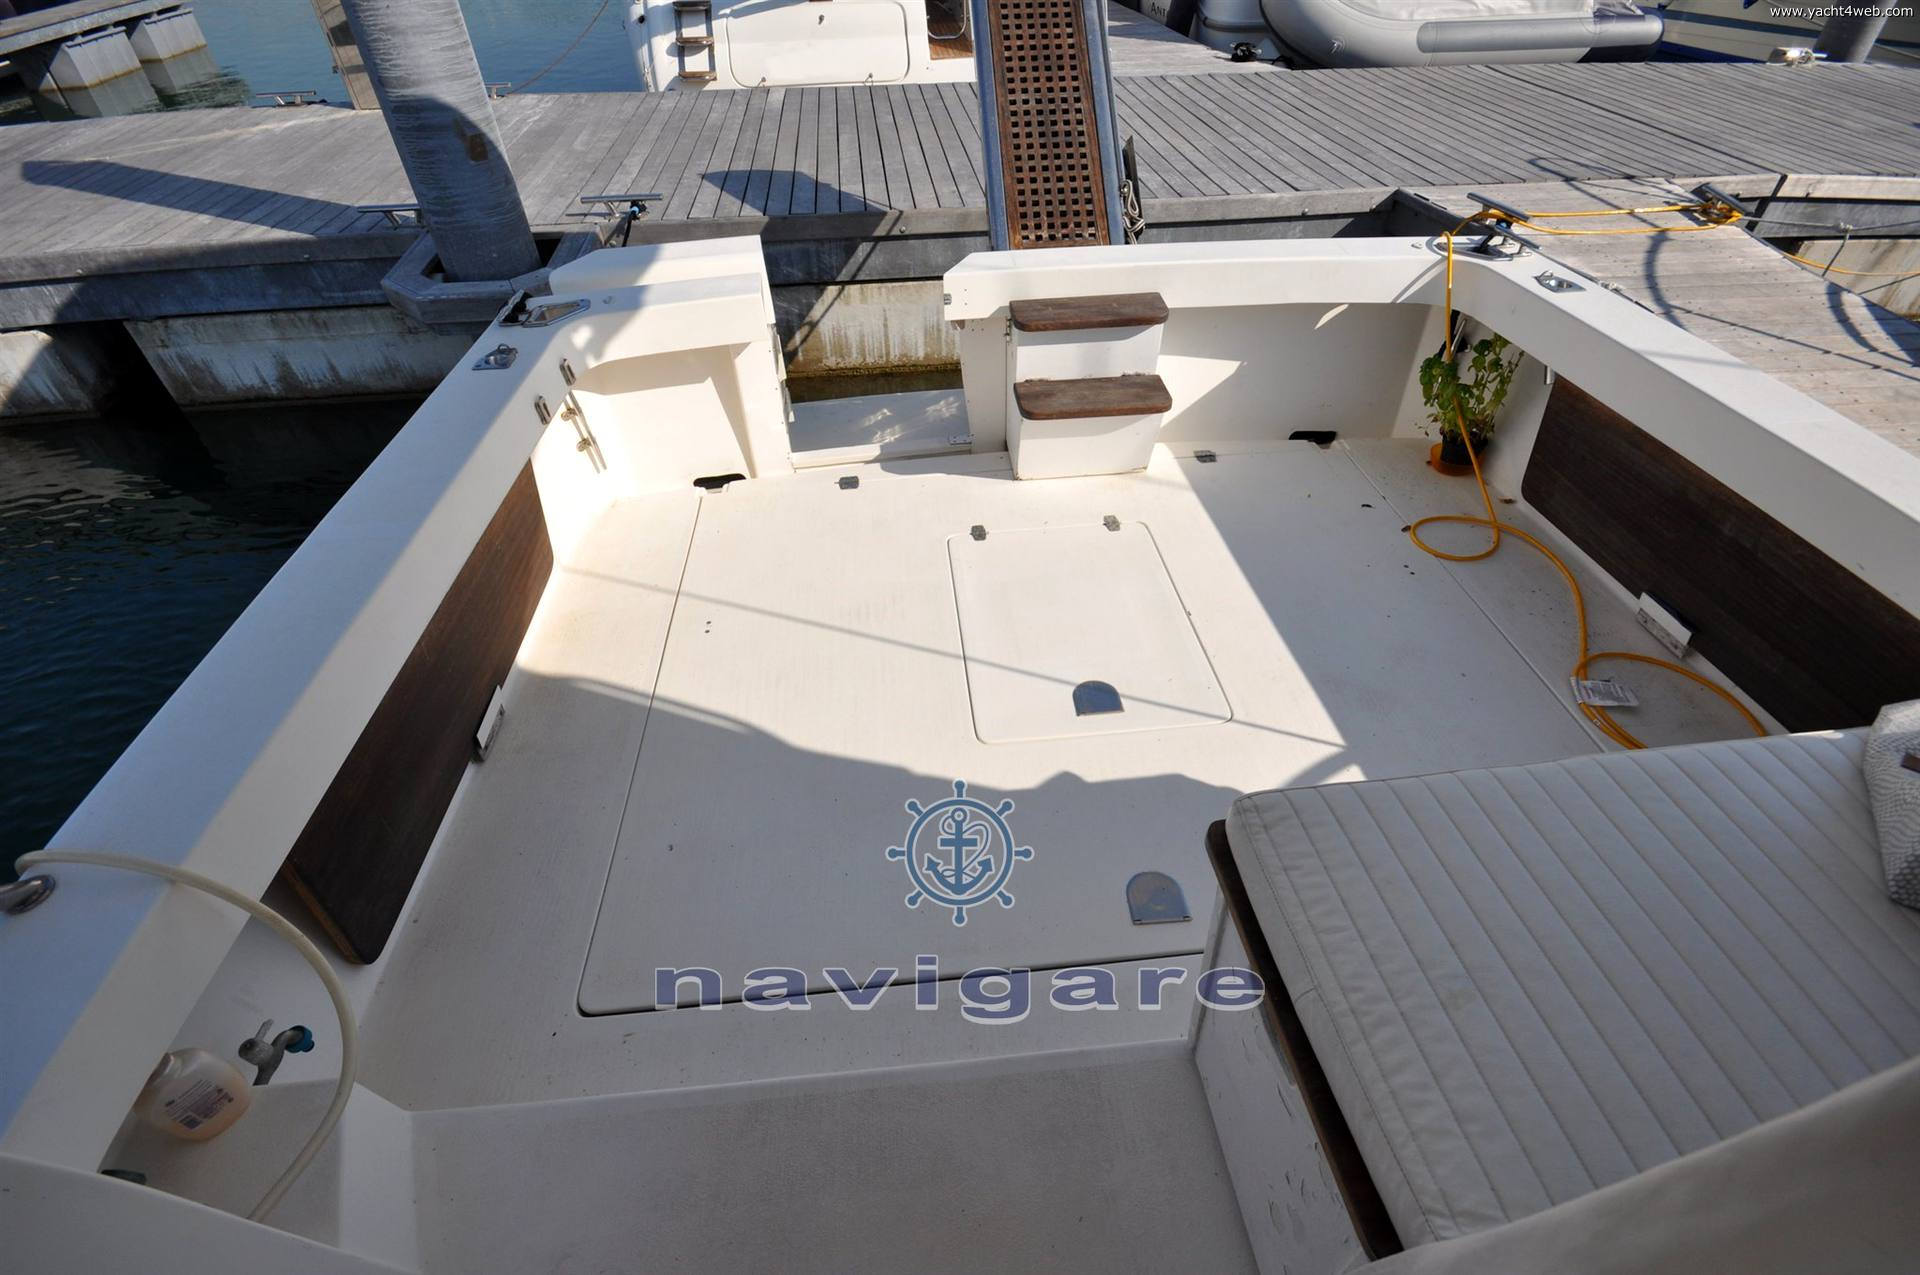 Plastik Space 310 cruiser Motor yacht